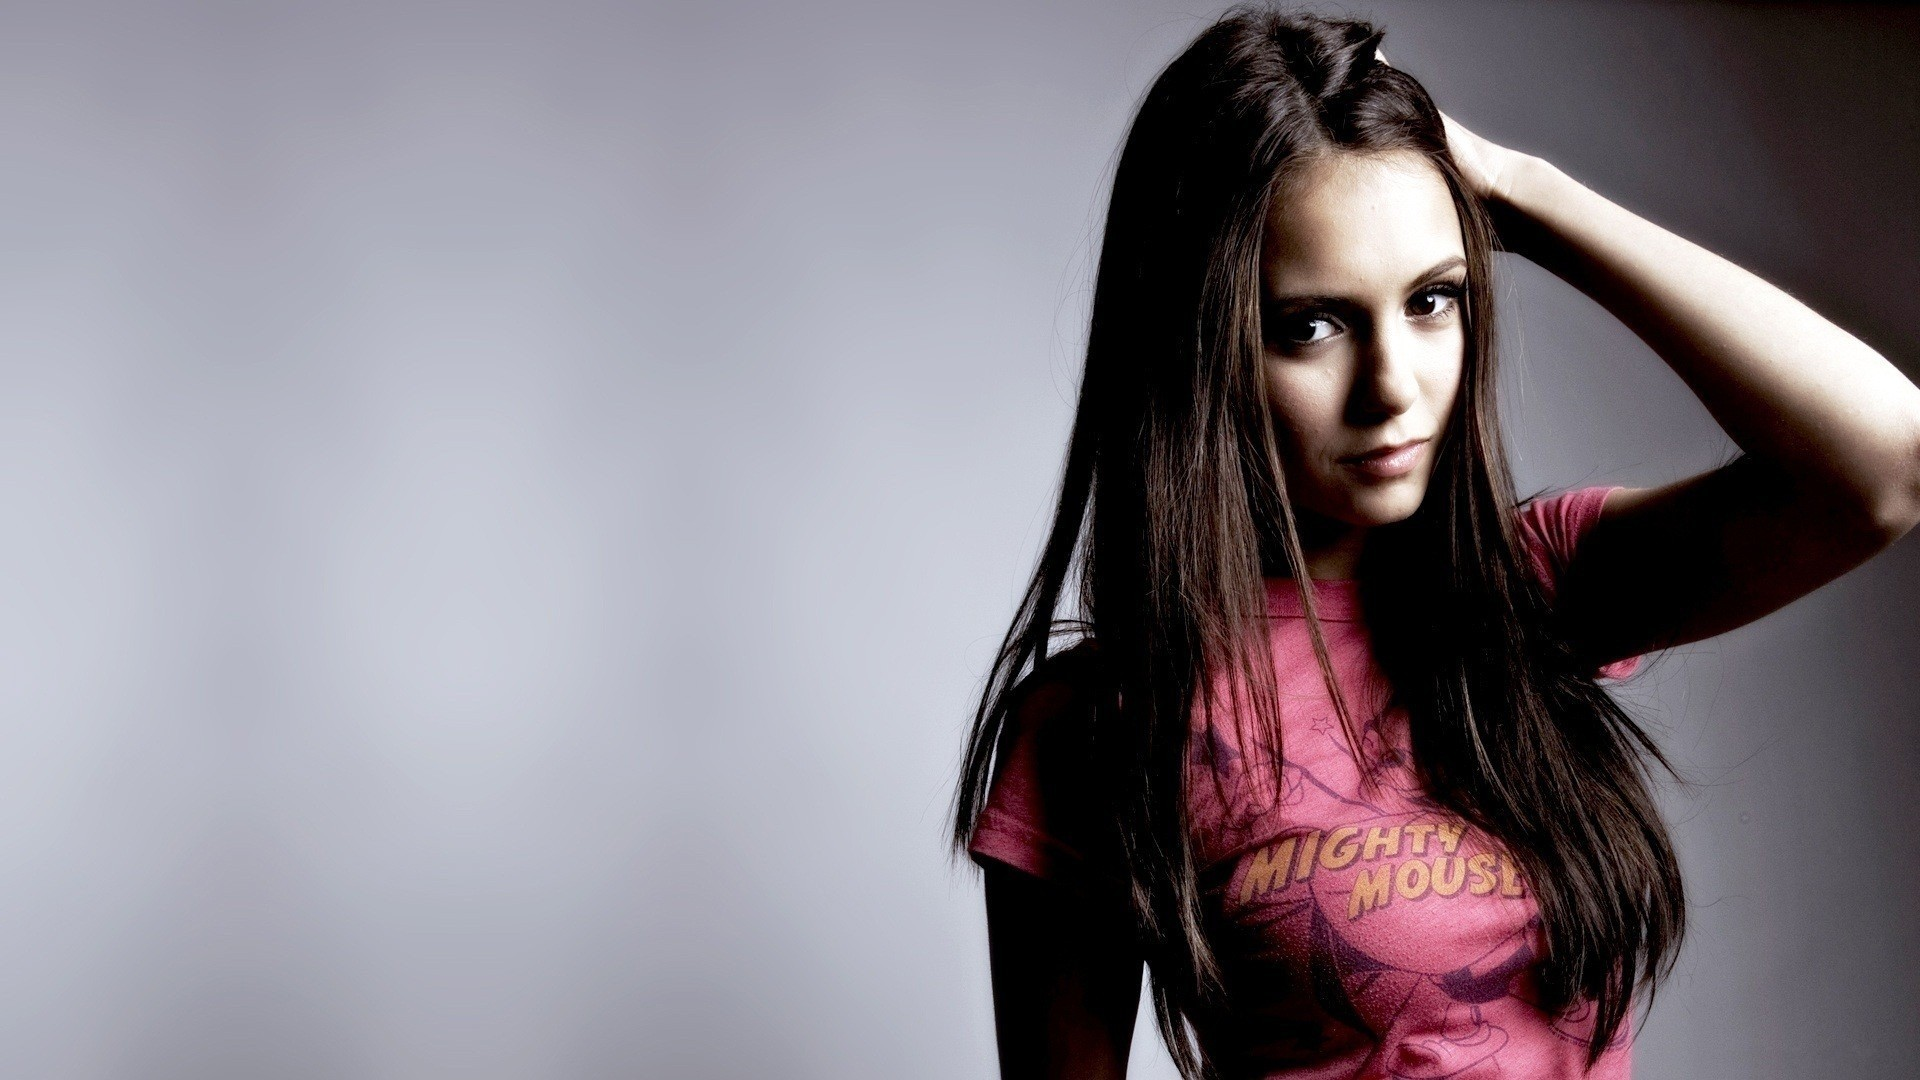 People 1920x1080 Nina Dobrev women actress celebrity brunette long hair T-shirt dark eyes eyes simple background pink tops